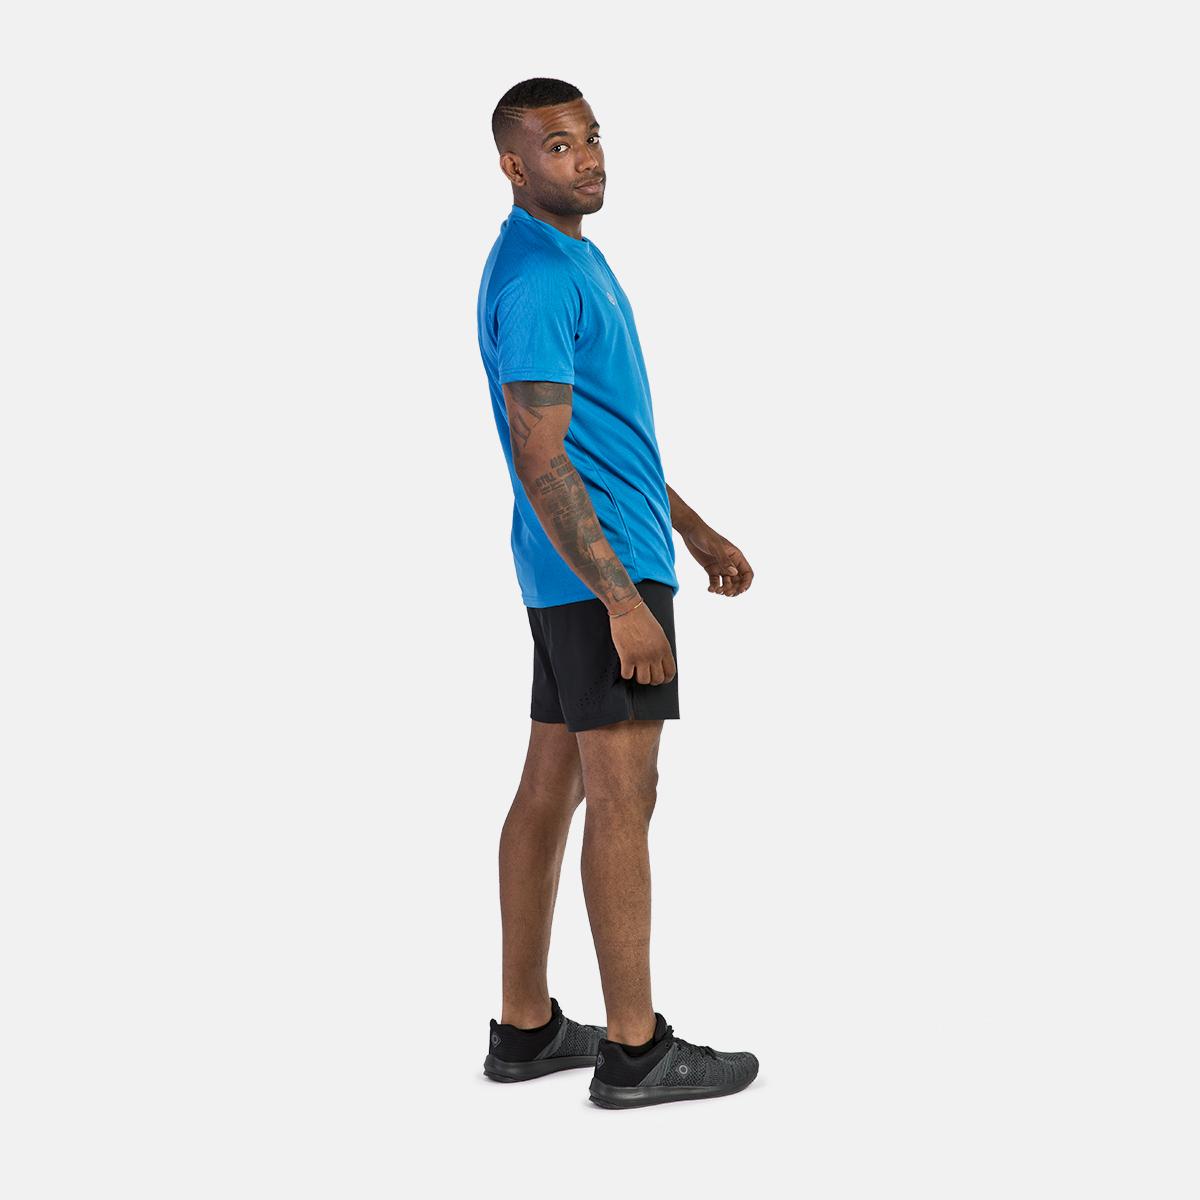 MAN'S RAVIER SHORT RUNNING PANT BLACK